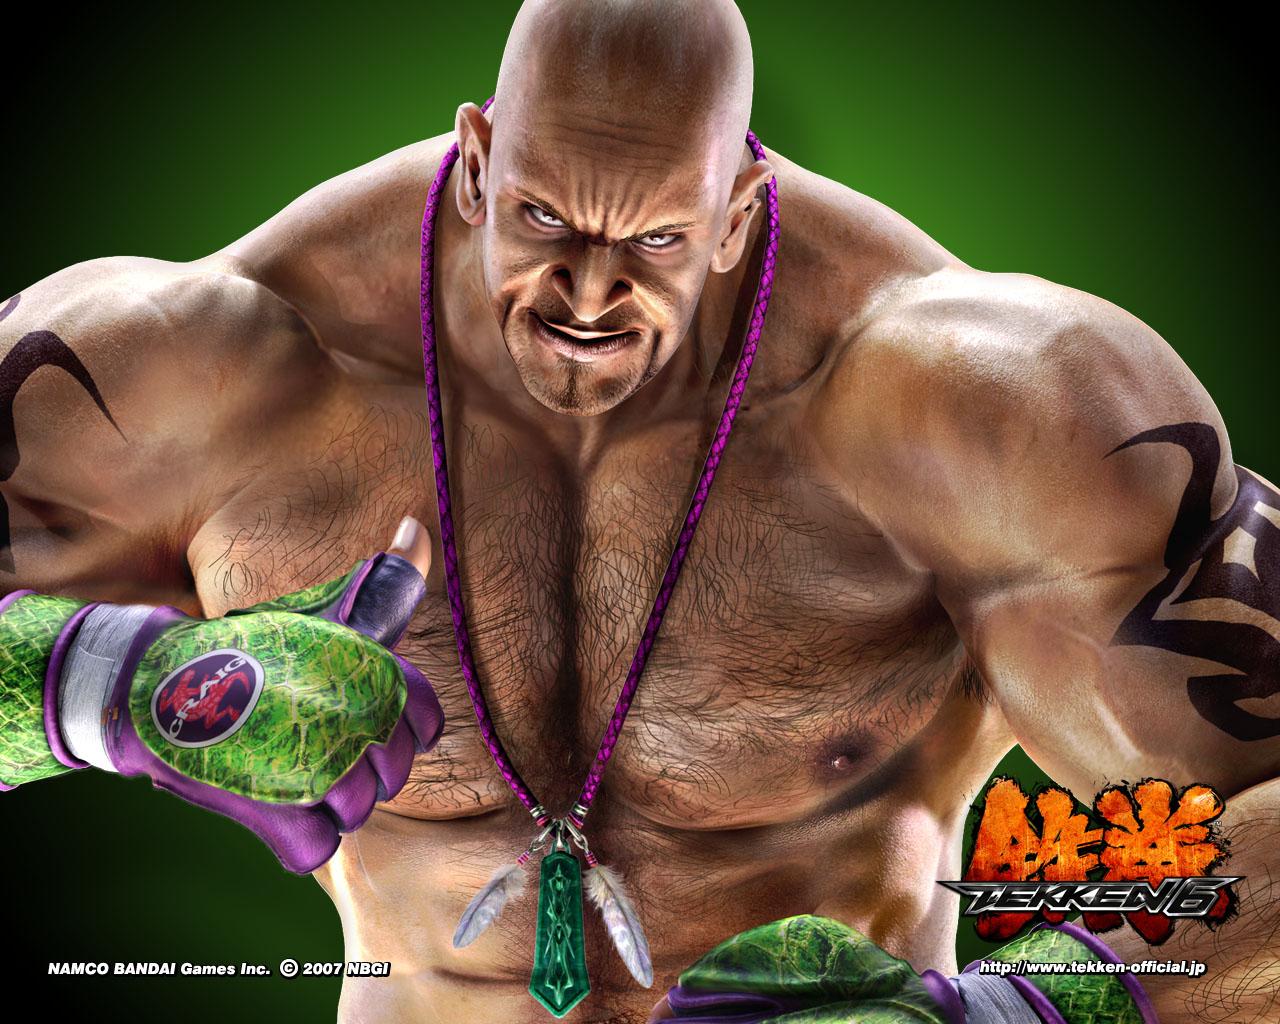 HD Wallpapers Craig Marduk Tekken 6